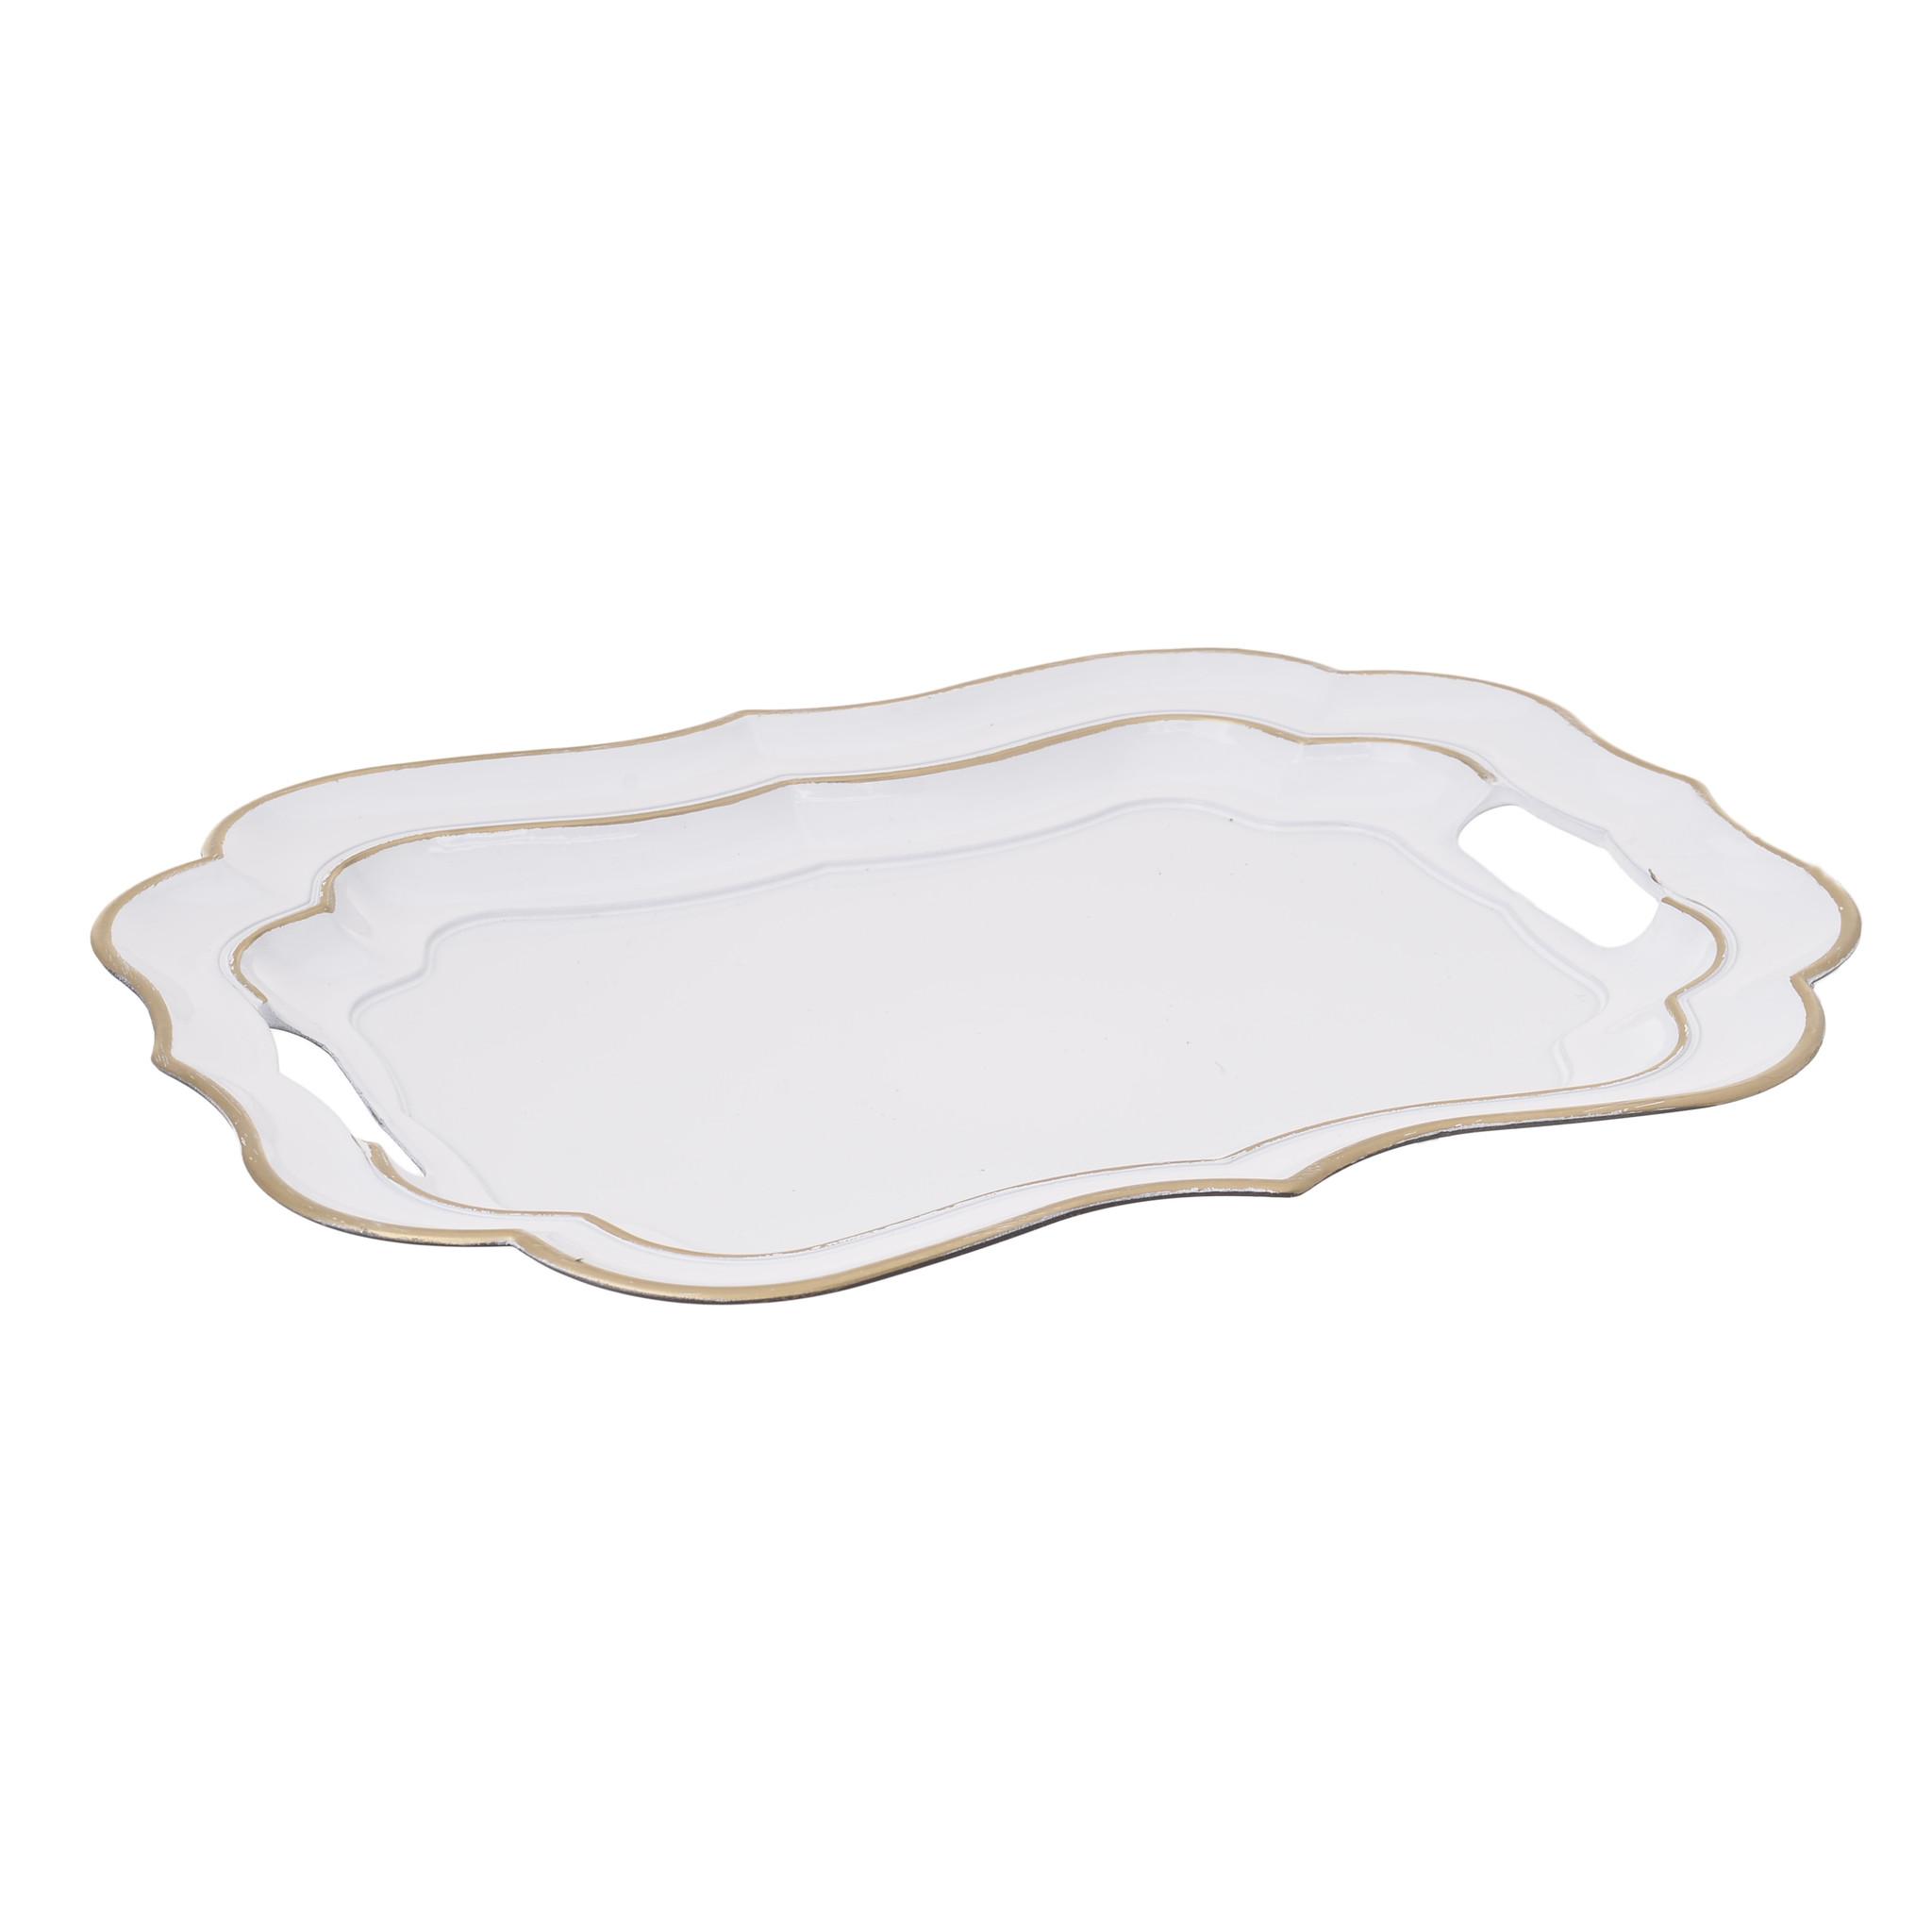 Блюдо AnsleyДекоративные блюда<br><br><br>Material: Пластик<br>Ширина см: 38<br>Высота см: 3<br>Глубина см: 28